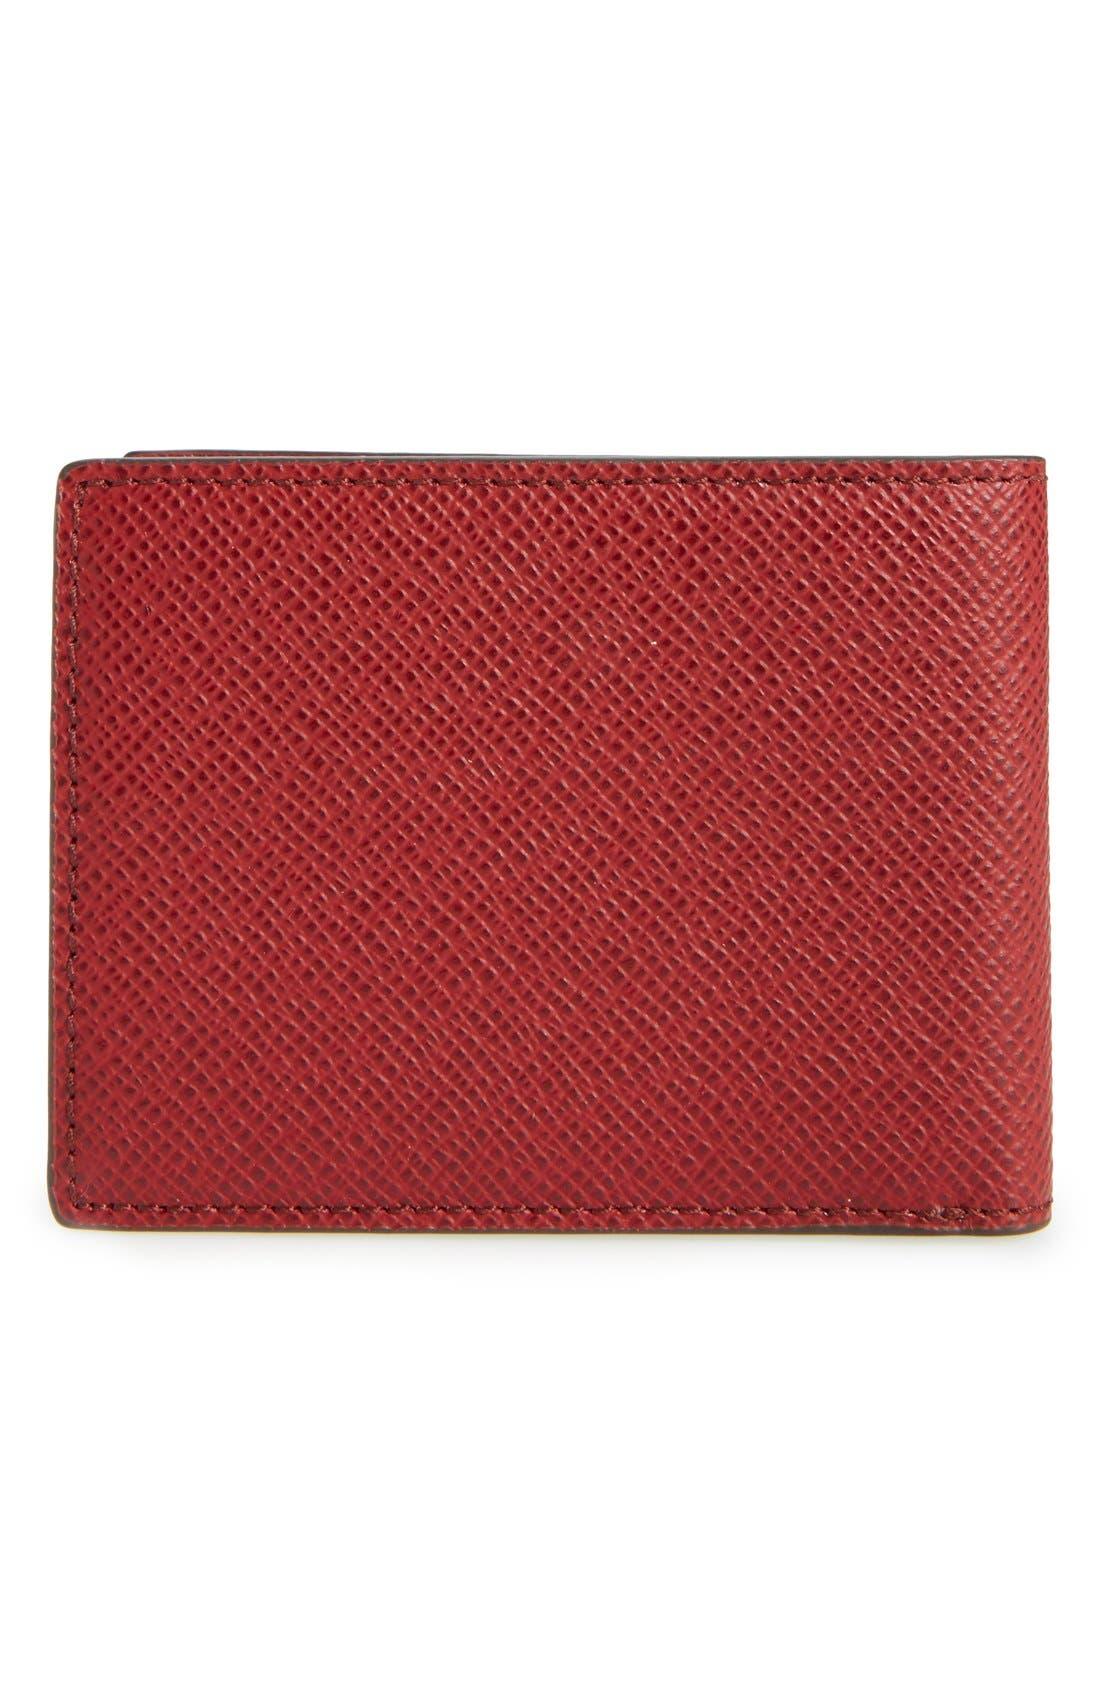 'Signature' Bifold Wallet,                             Alternate thumbnail 8, color,